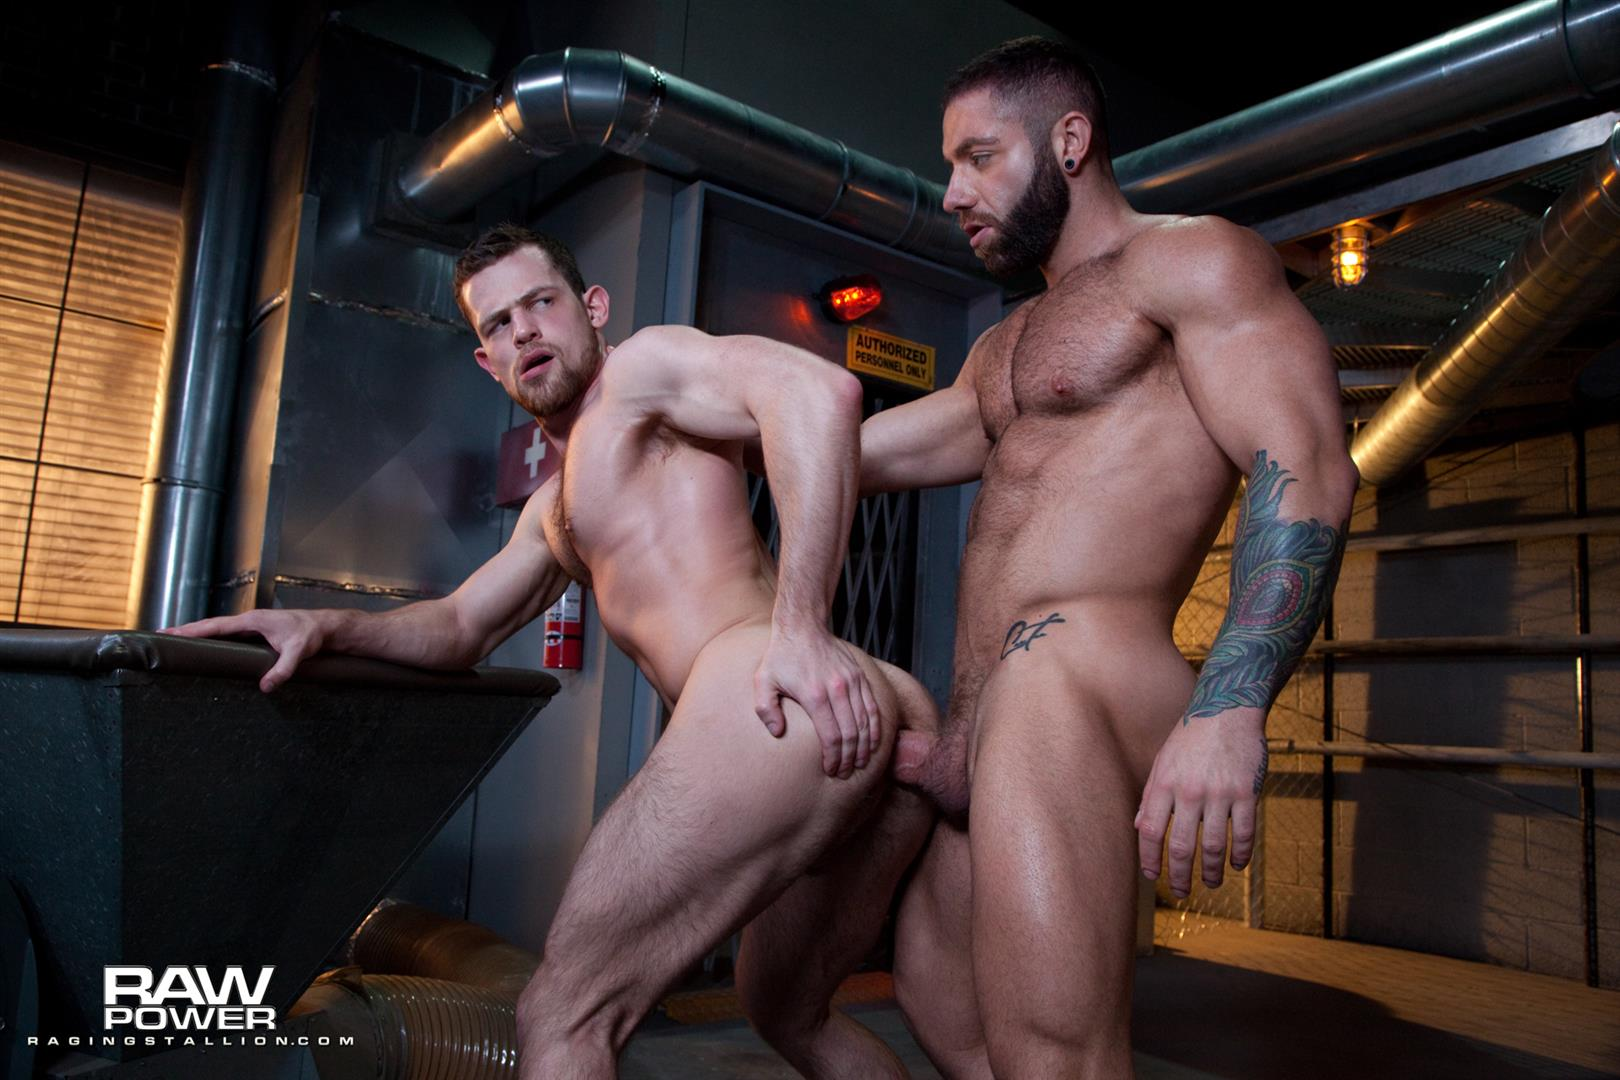 Raging-Stallion-Eddy-Ceetee-and-Kurtis-Wolfe-Big-Dick-Muscle-Hunks-Bareback-Sex-Video-11 ALERT: Raging Stallion Goes Bareback For The First Time With Eddy Ceetee and Kurtis Wolfe